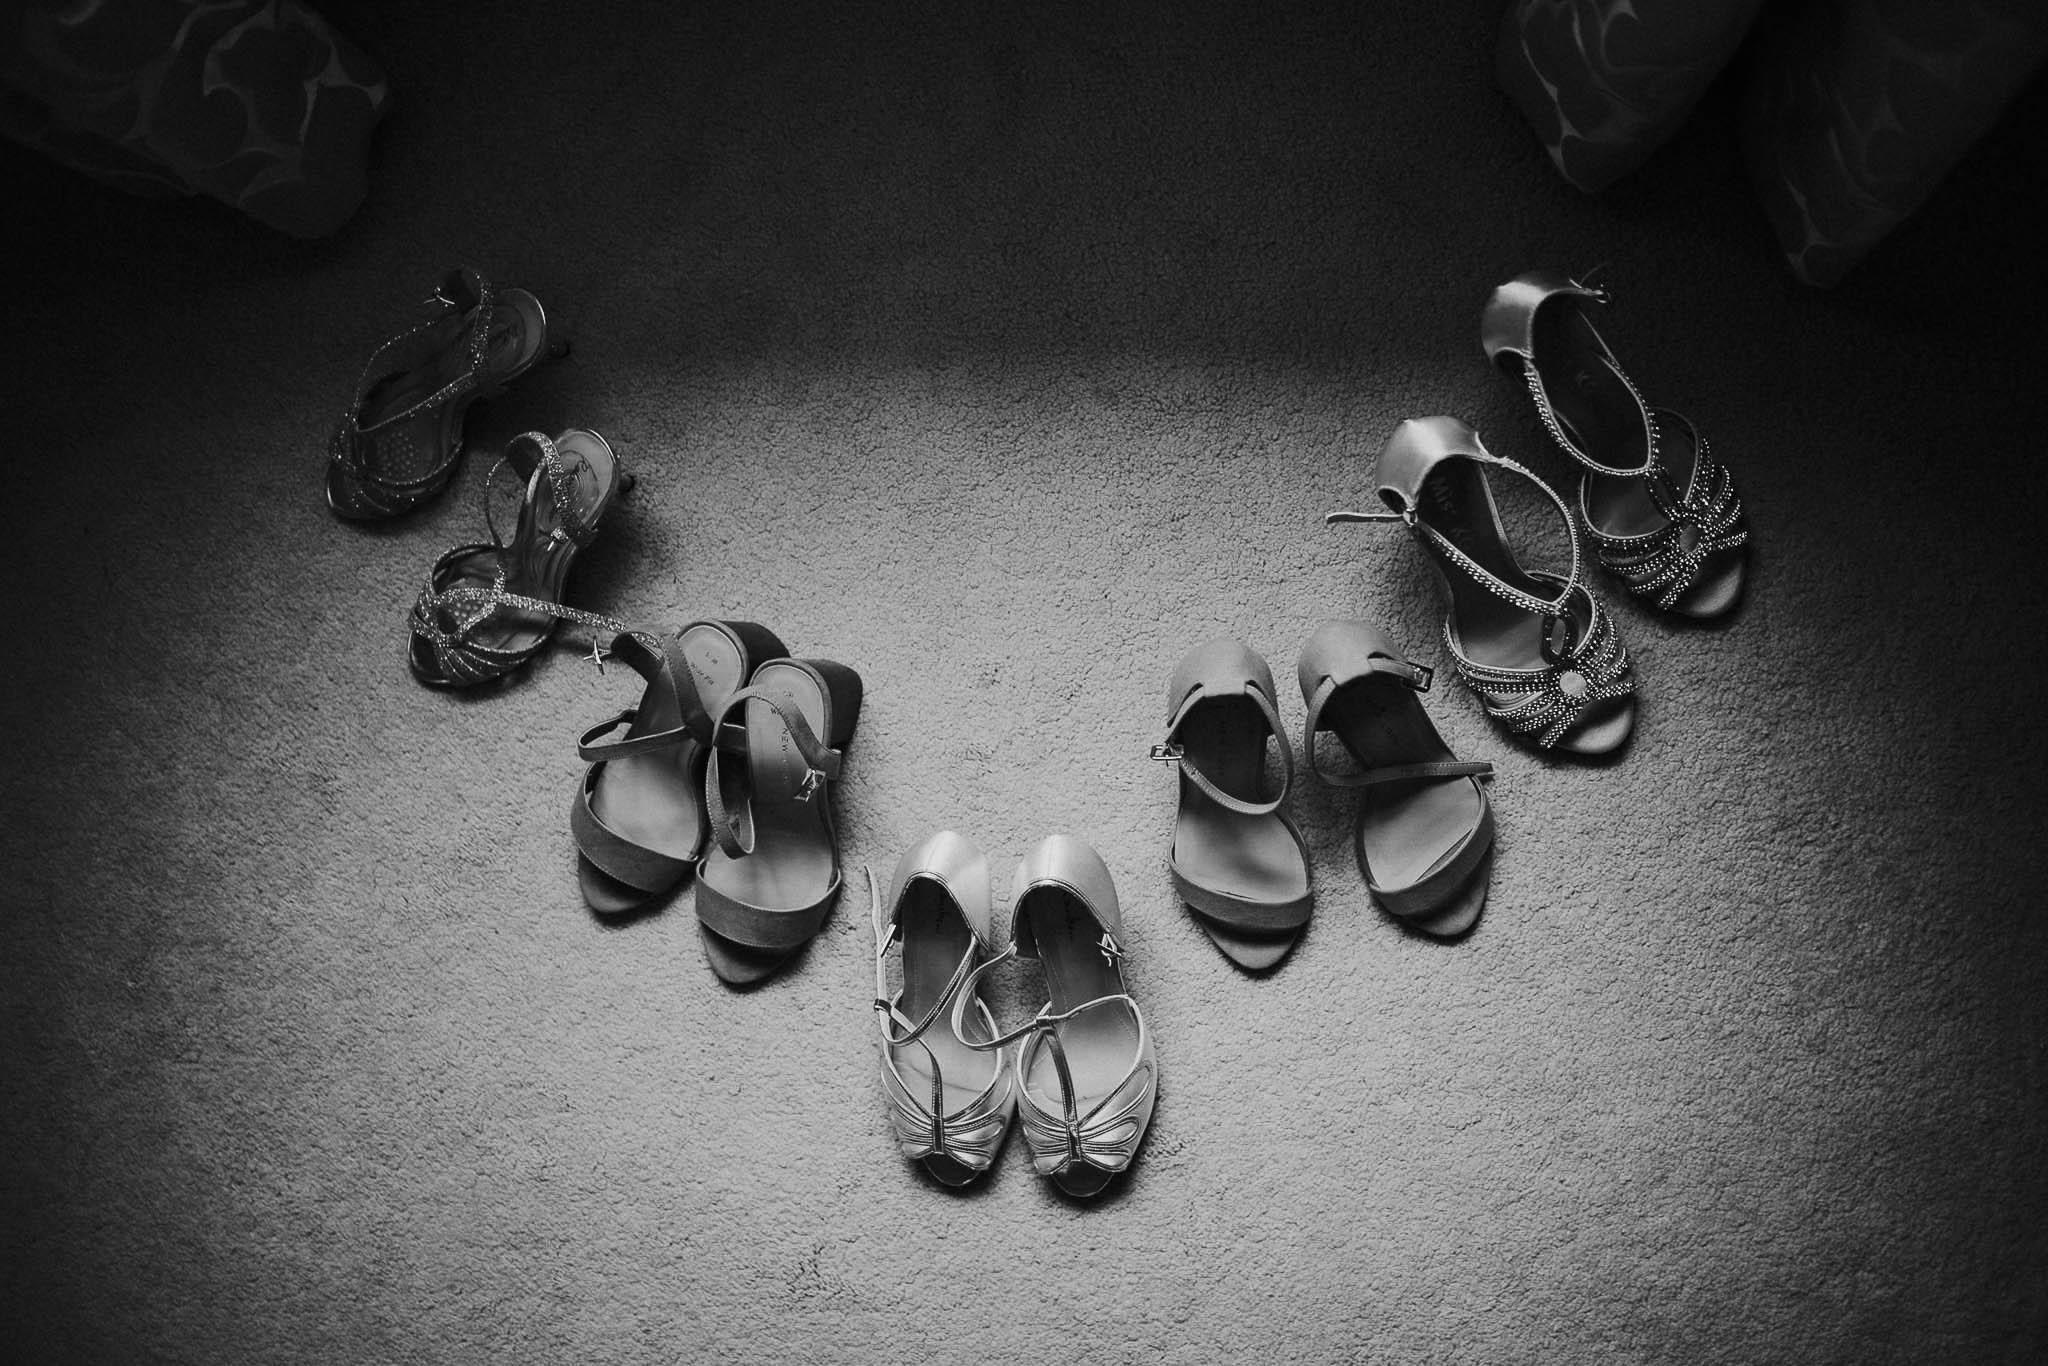 creative-wedding-shoe-picture